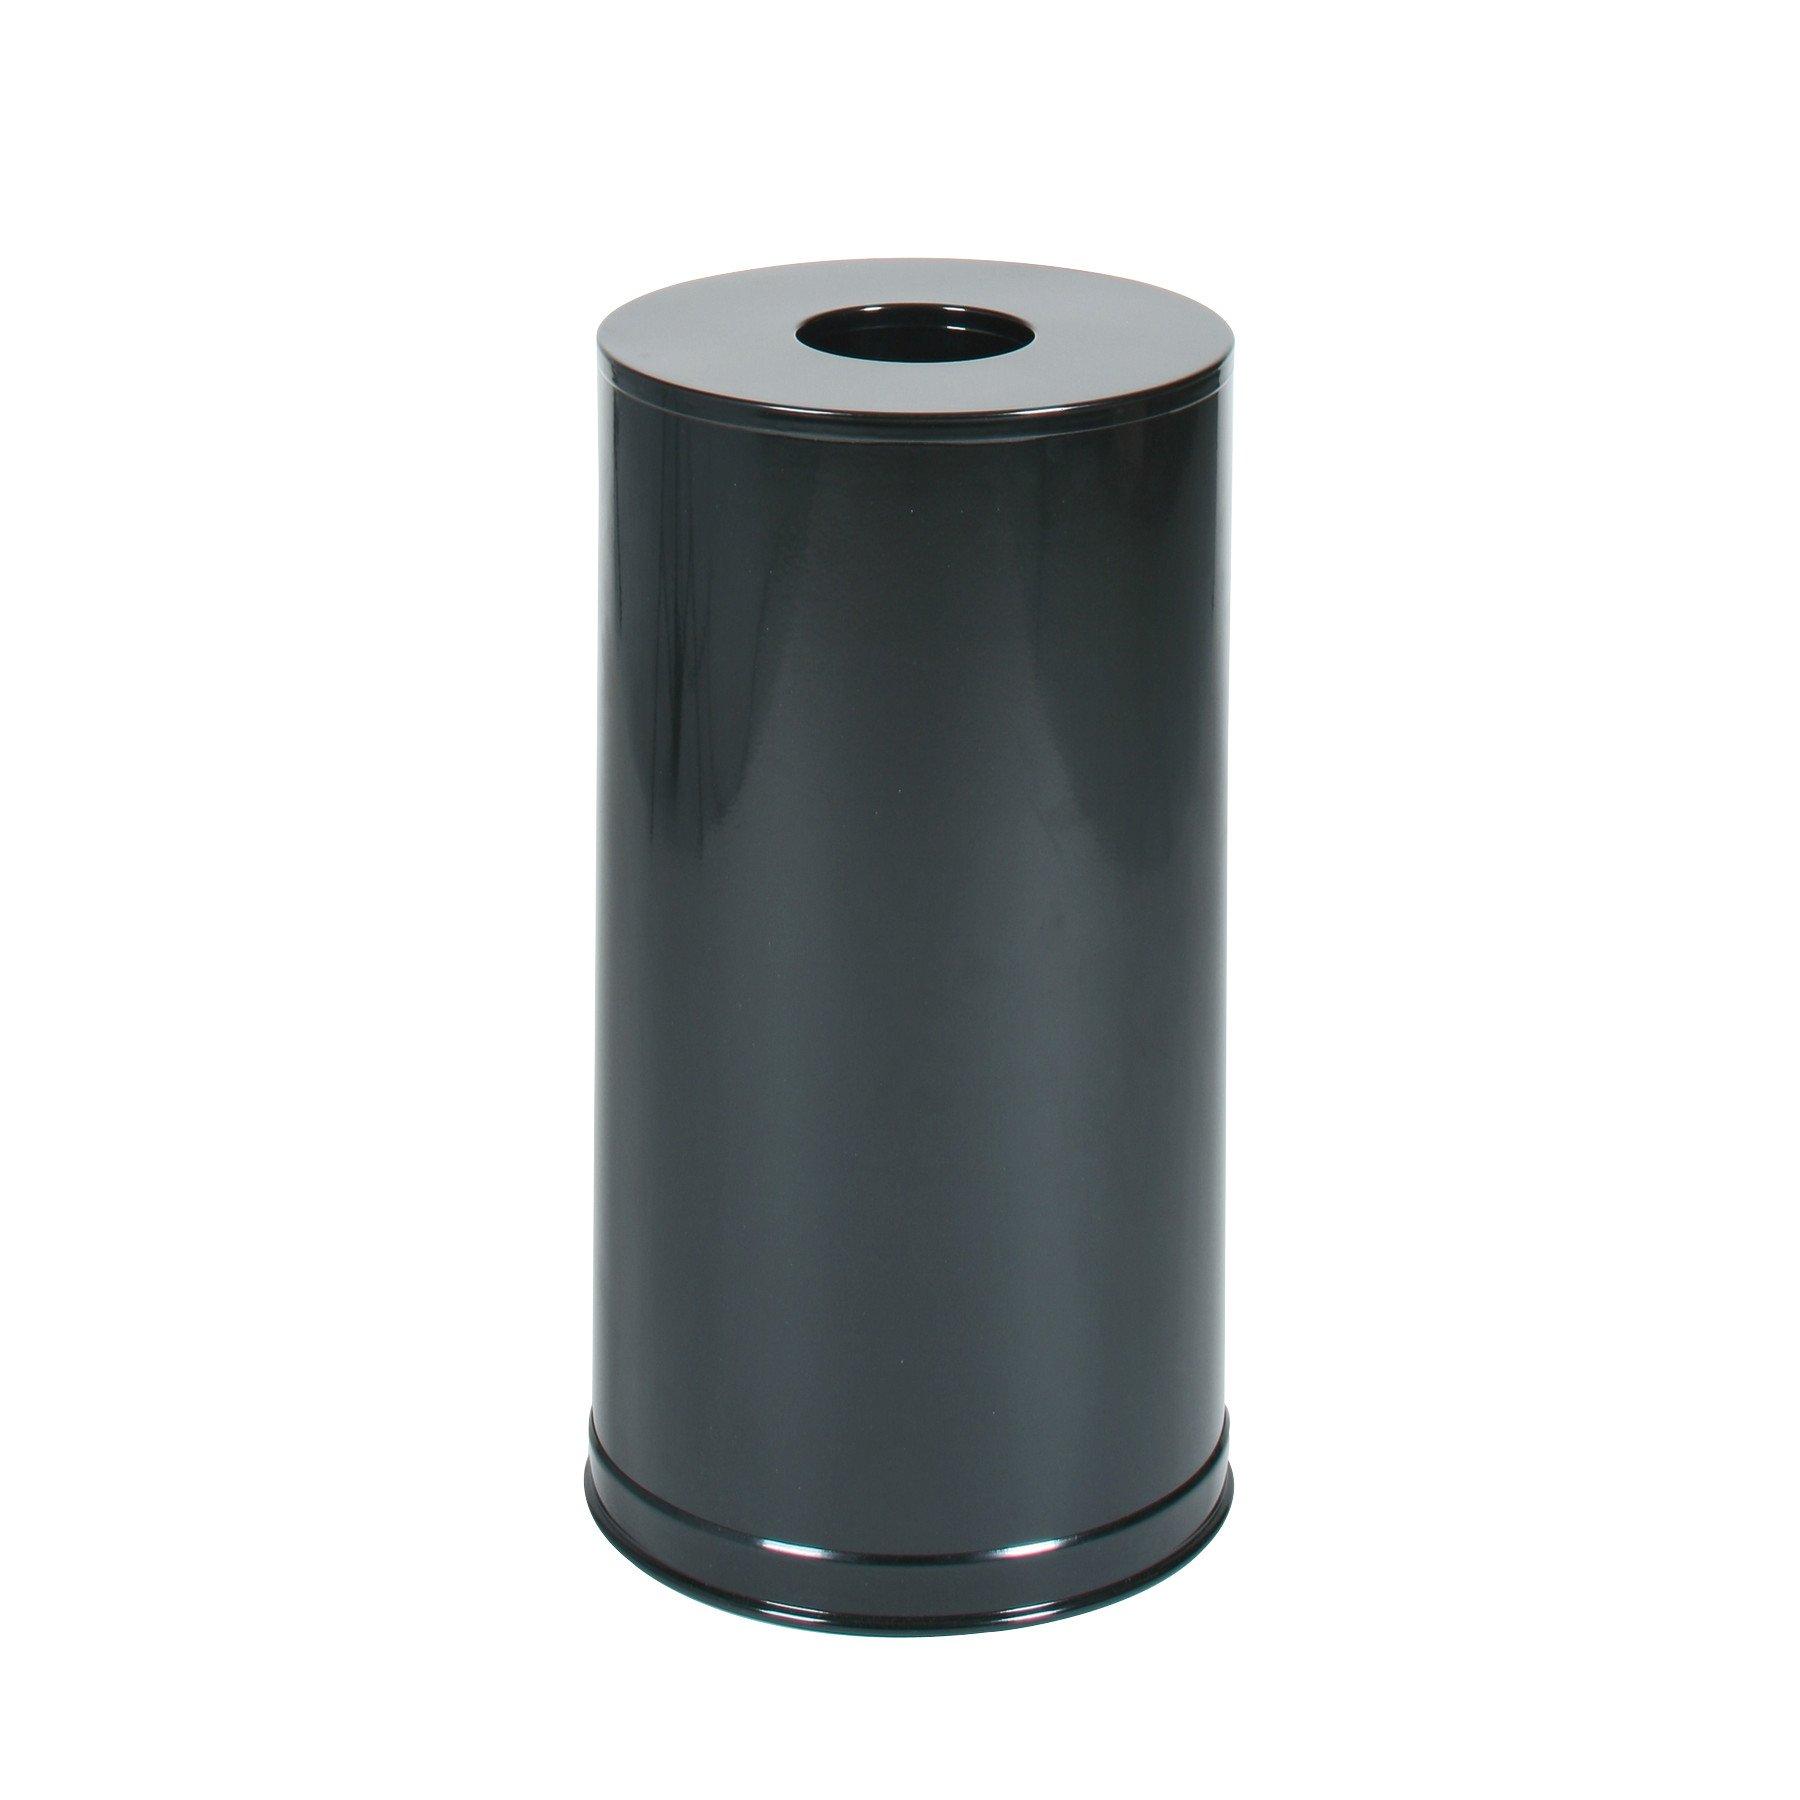 Rubbermaid Commercial Metallic Series Trash Can, 15 Gallon, Black Gloss